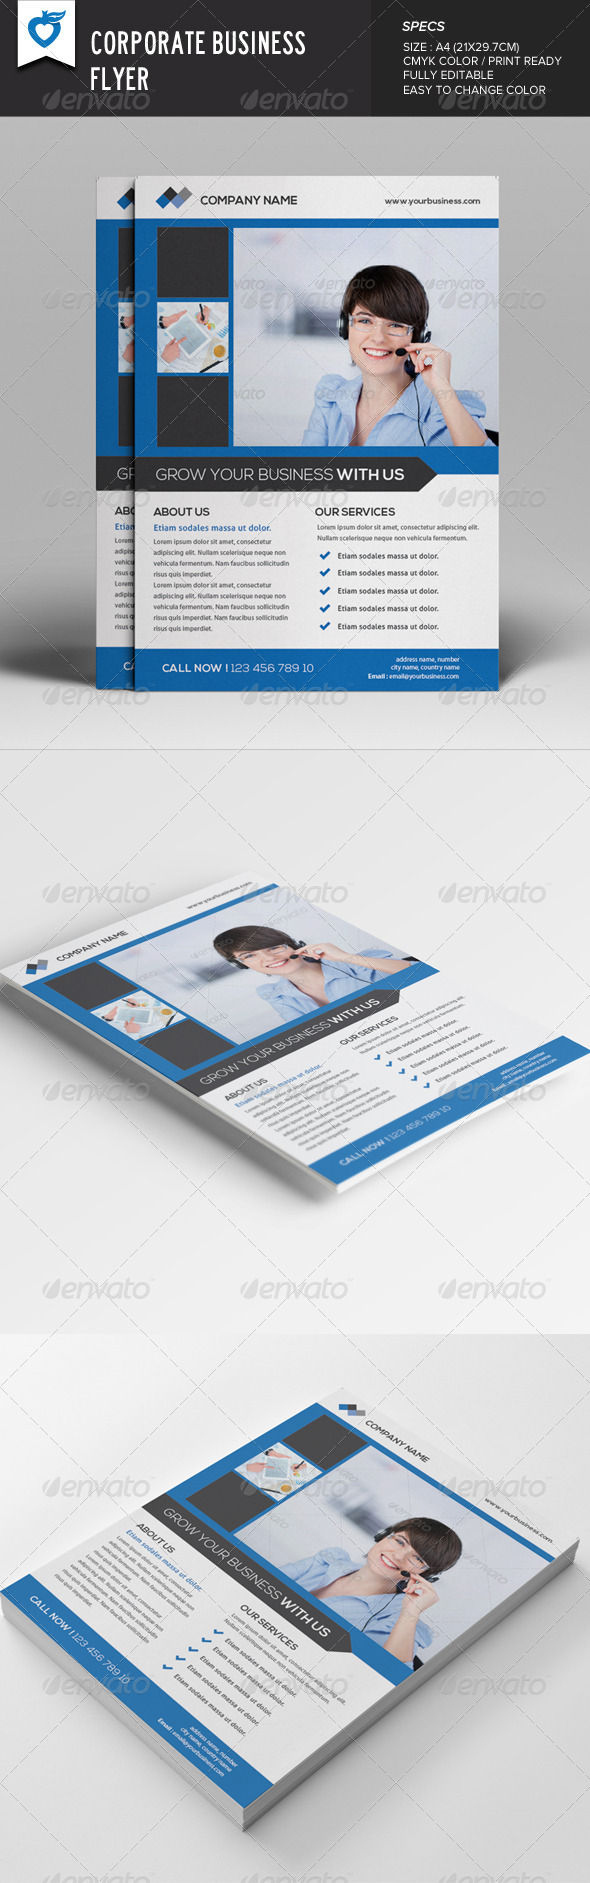 Corporate Business Flyer v7